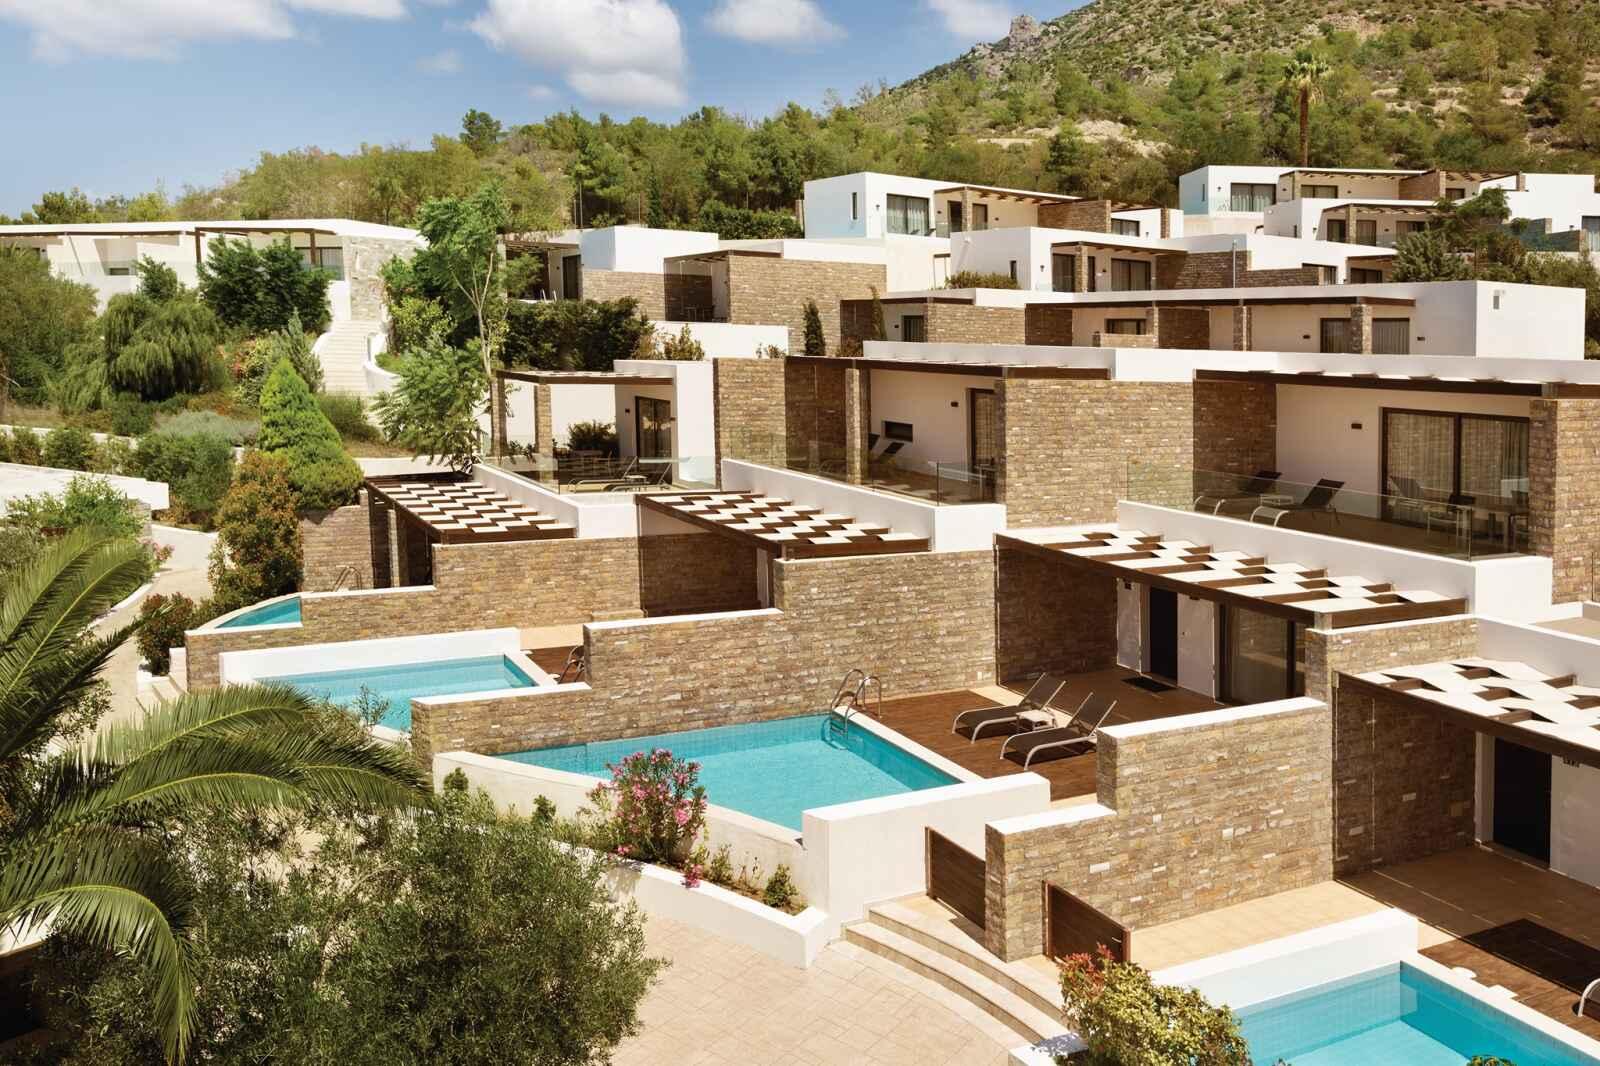 Hôtel Wyndham Loutraki Poseidon resort - 5*